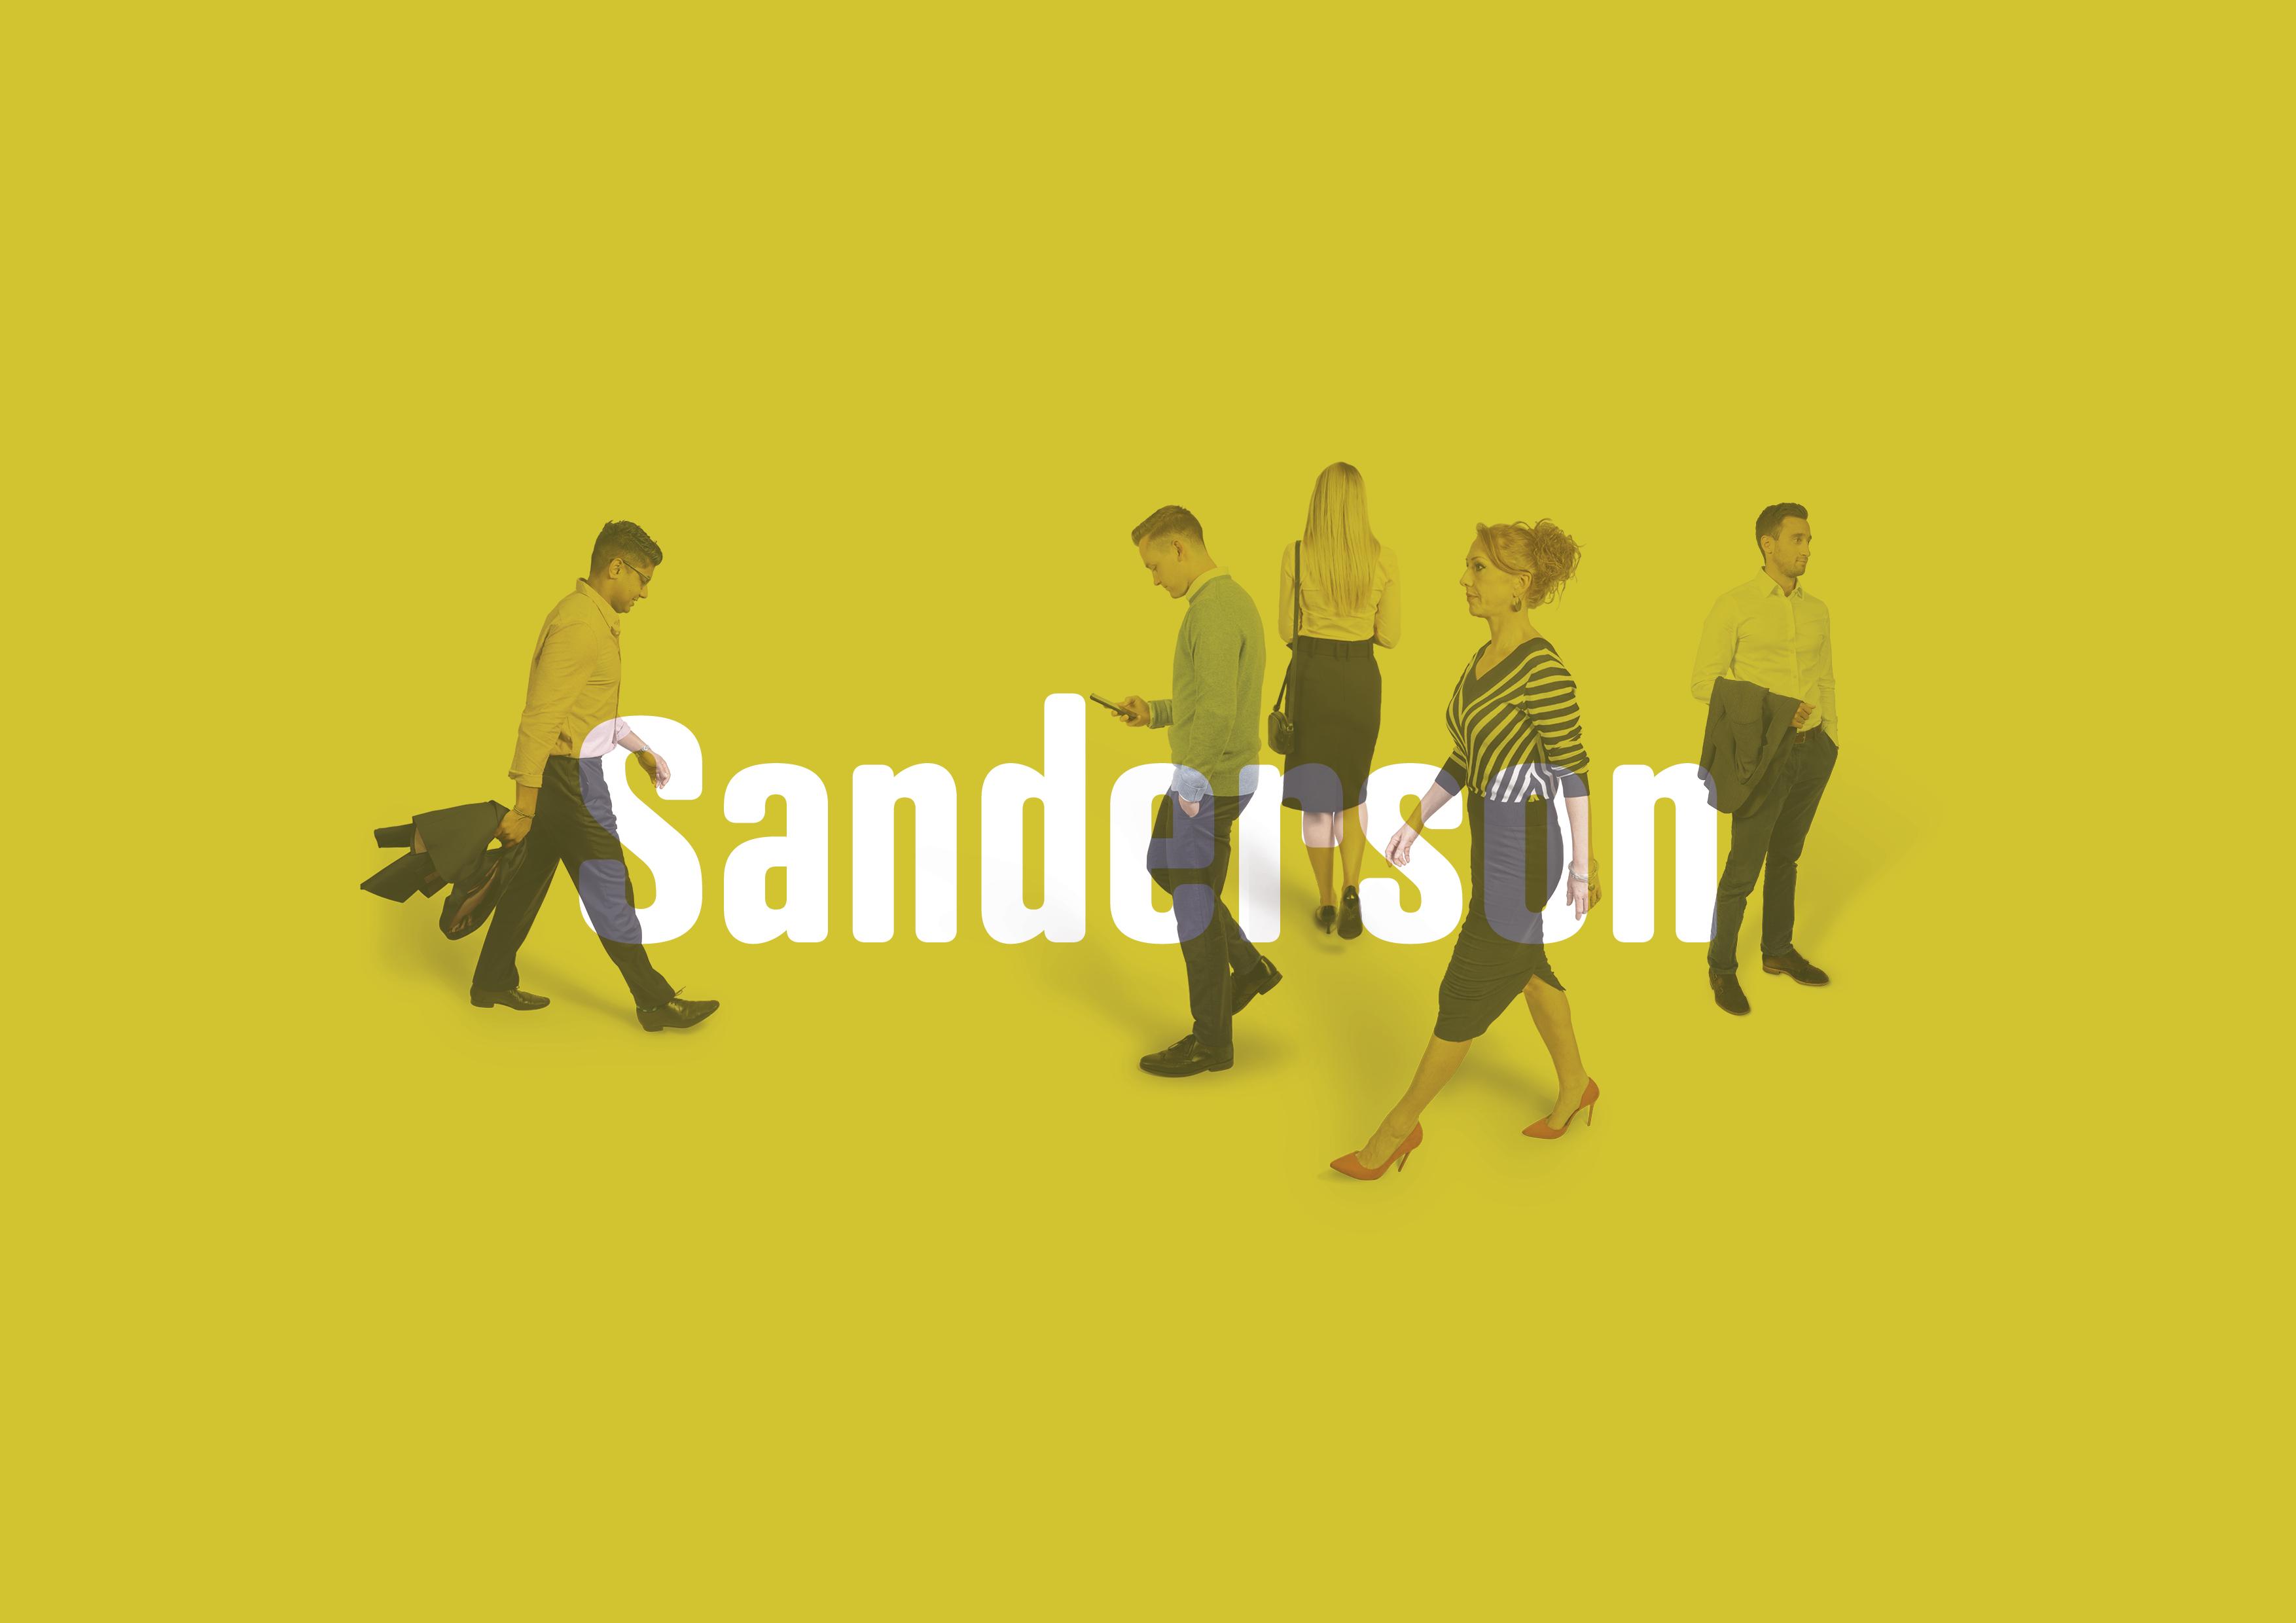 Sanderson RSG rebrand image